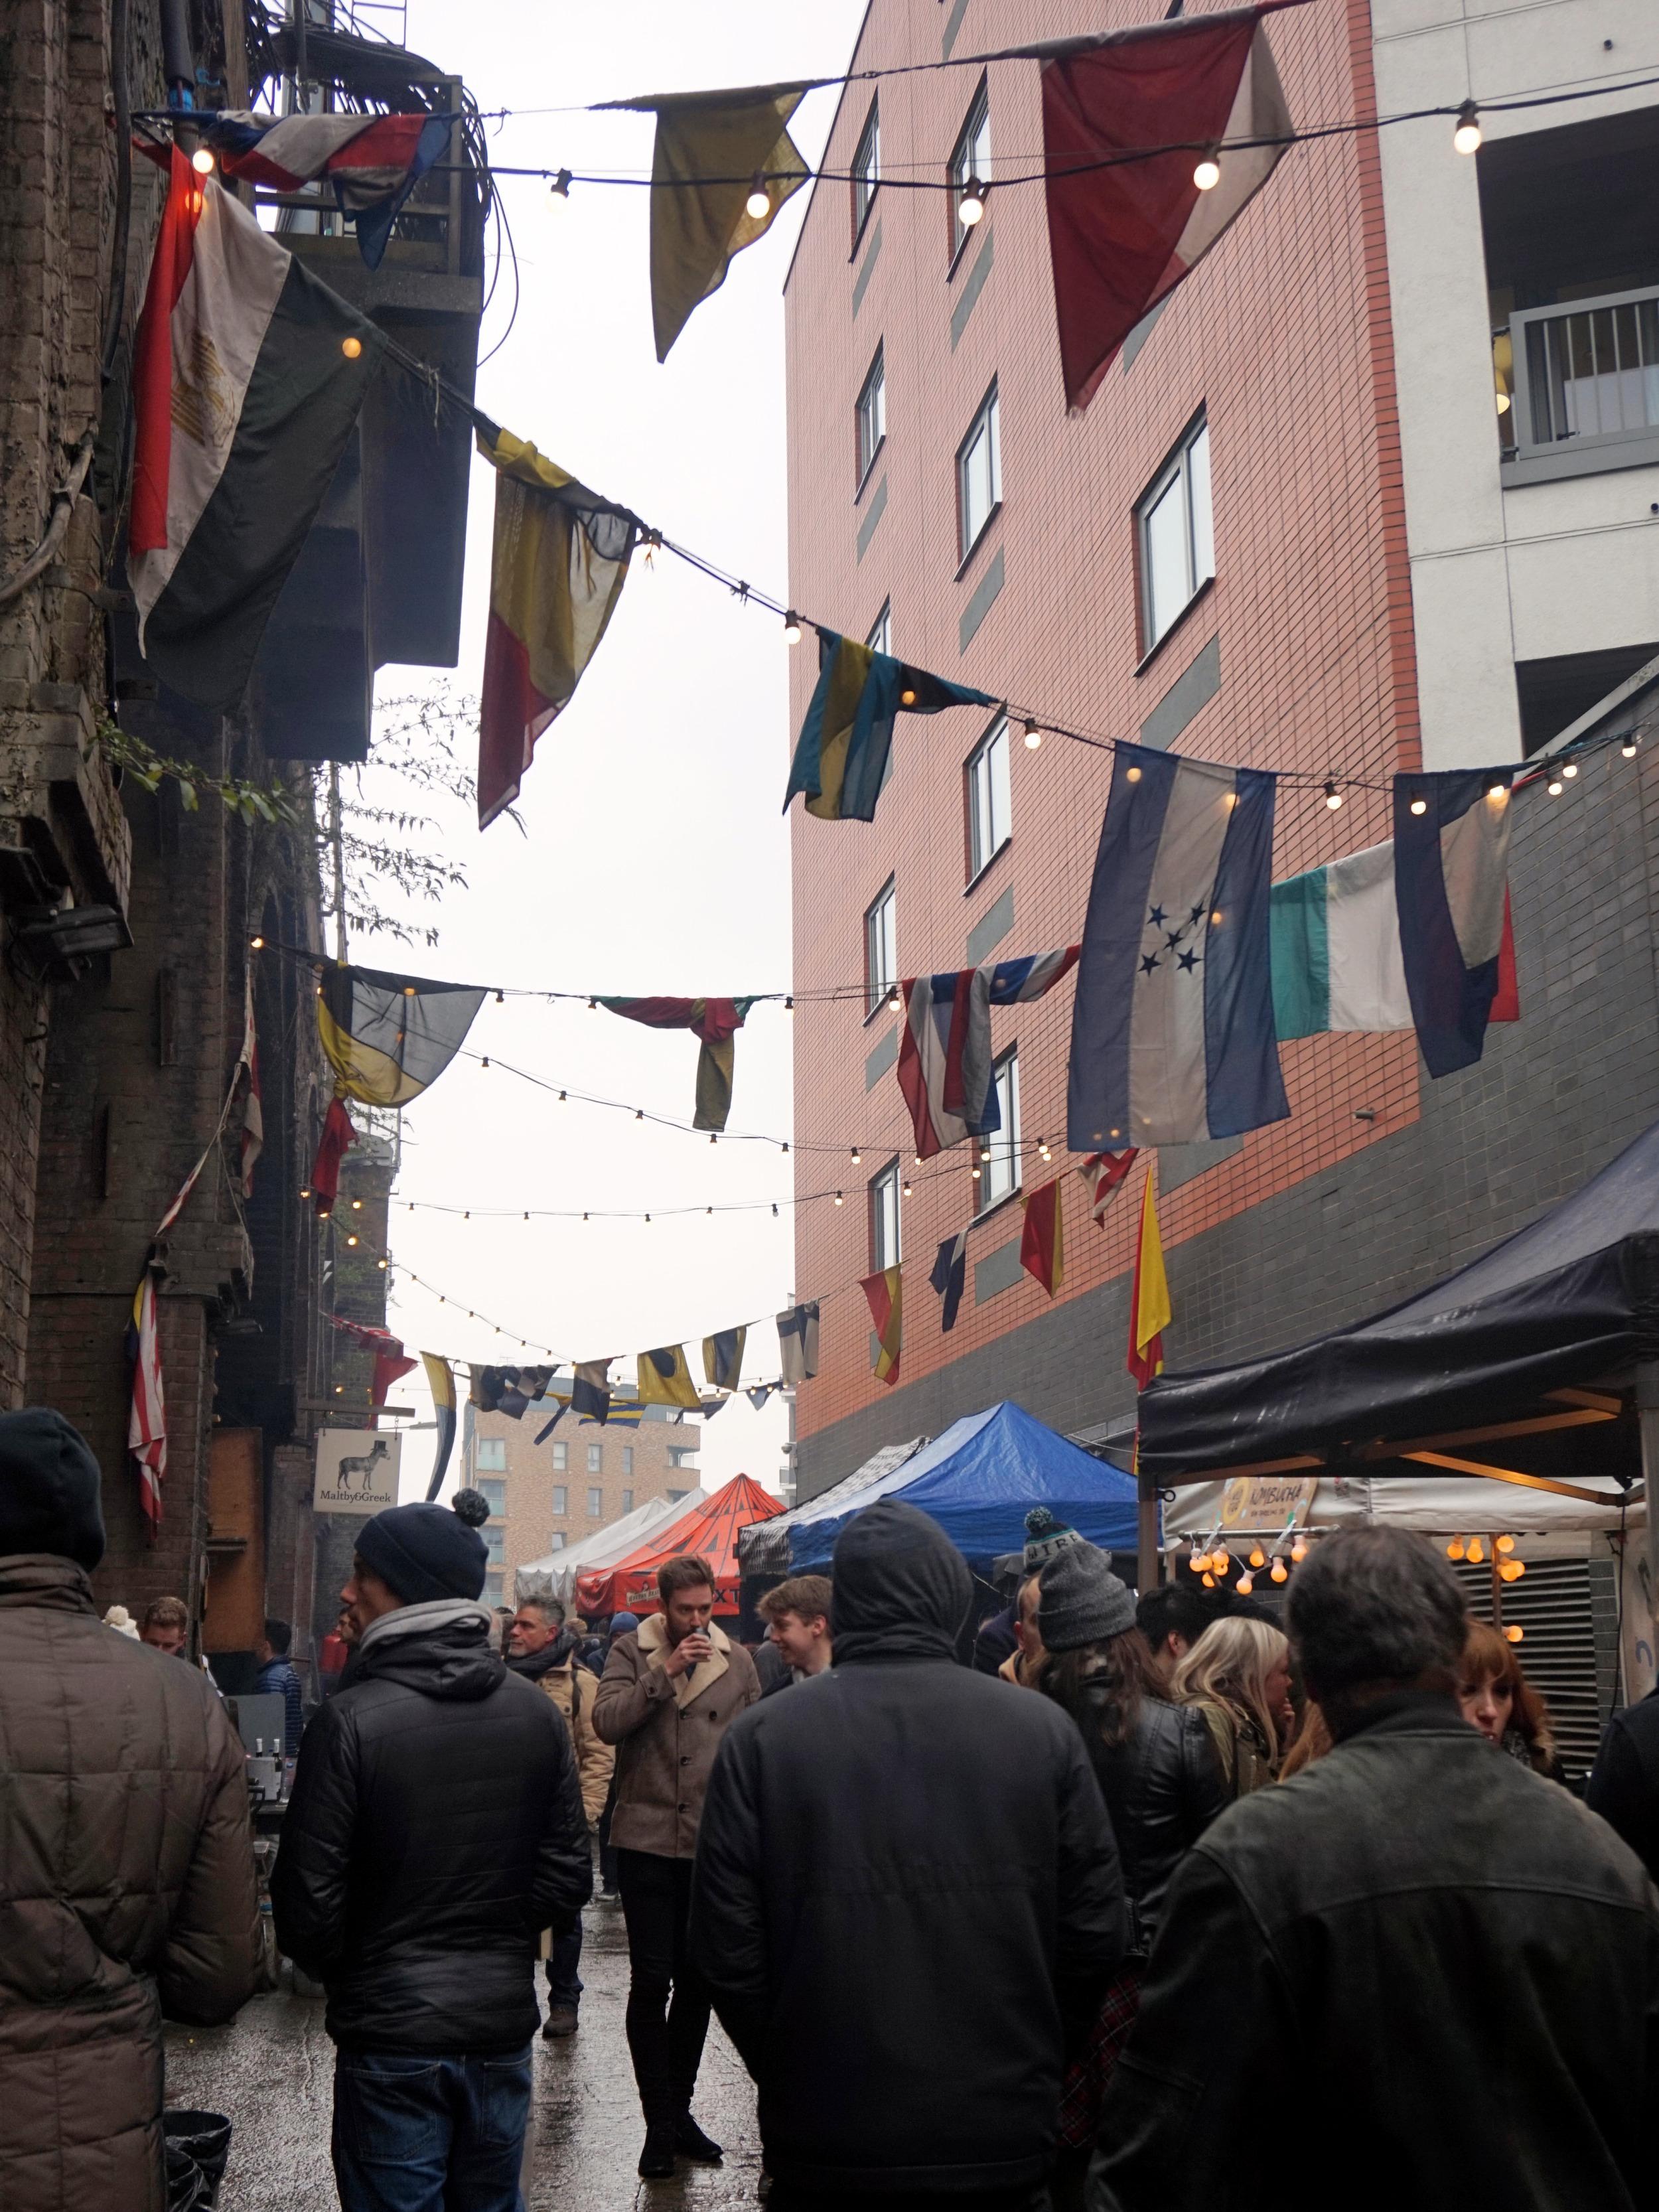 maltby-street-market-12